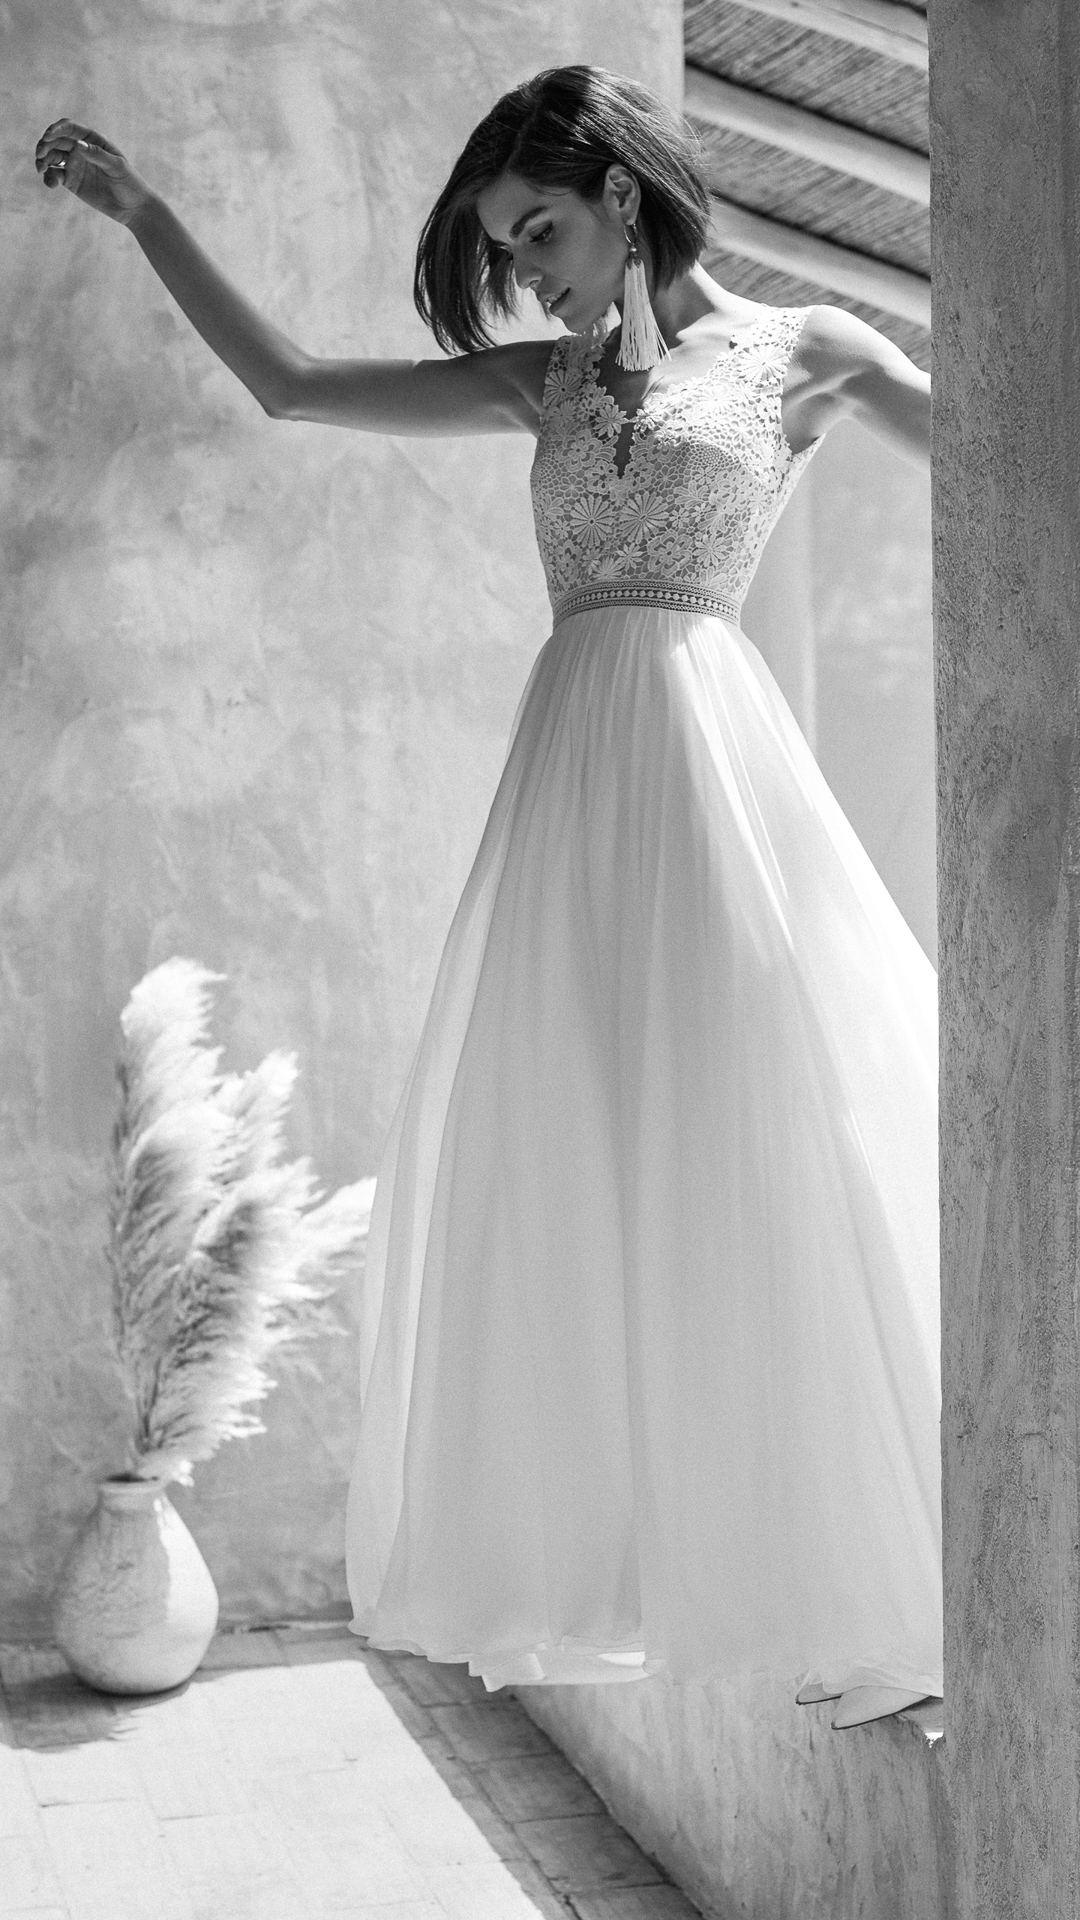 Dreamlover - Marylise Brautkleider 2020